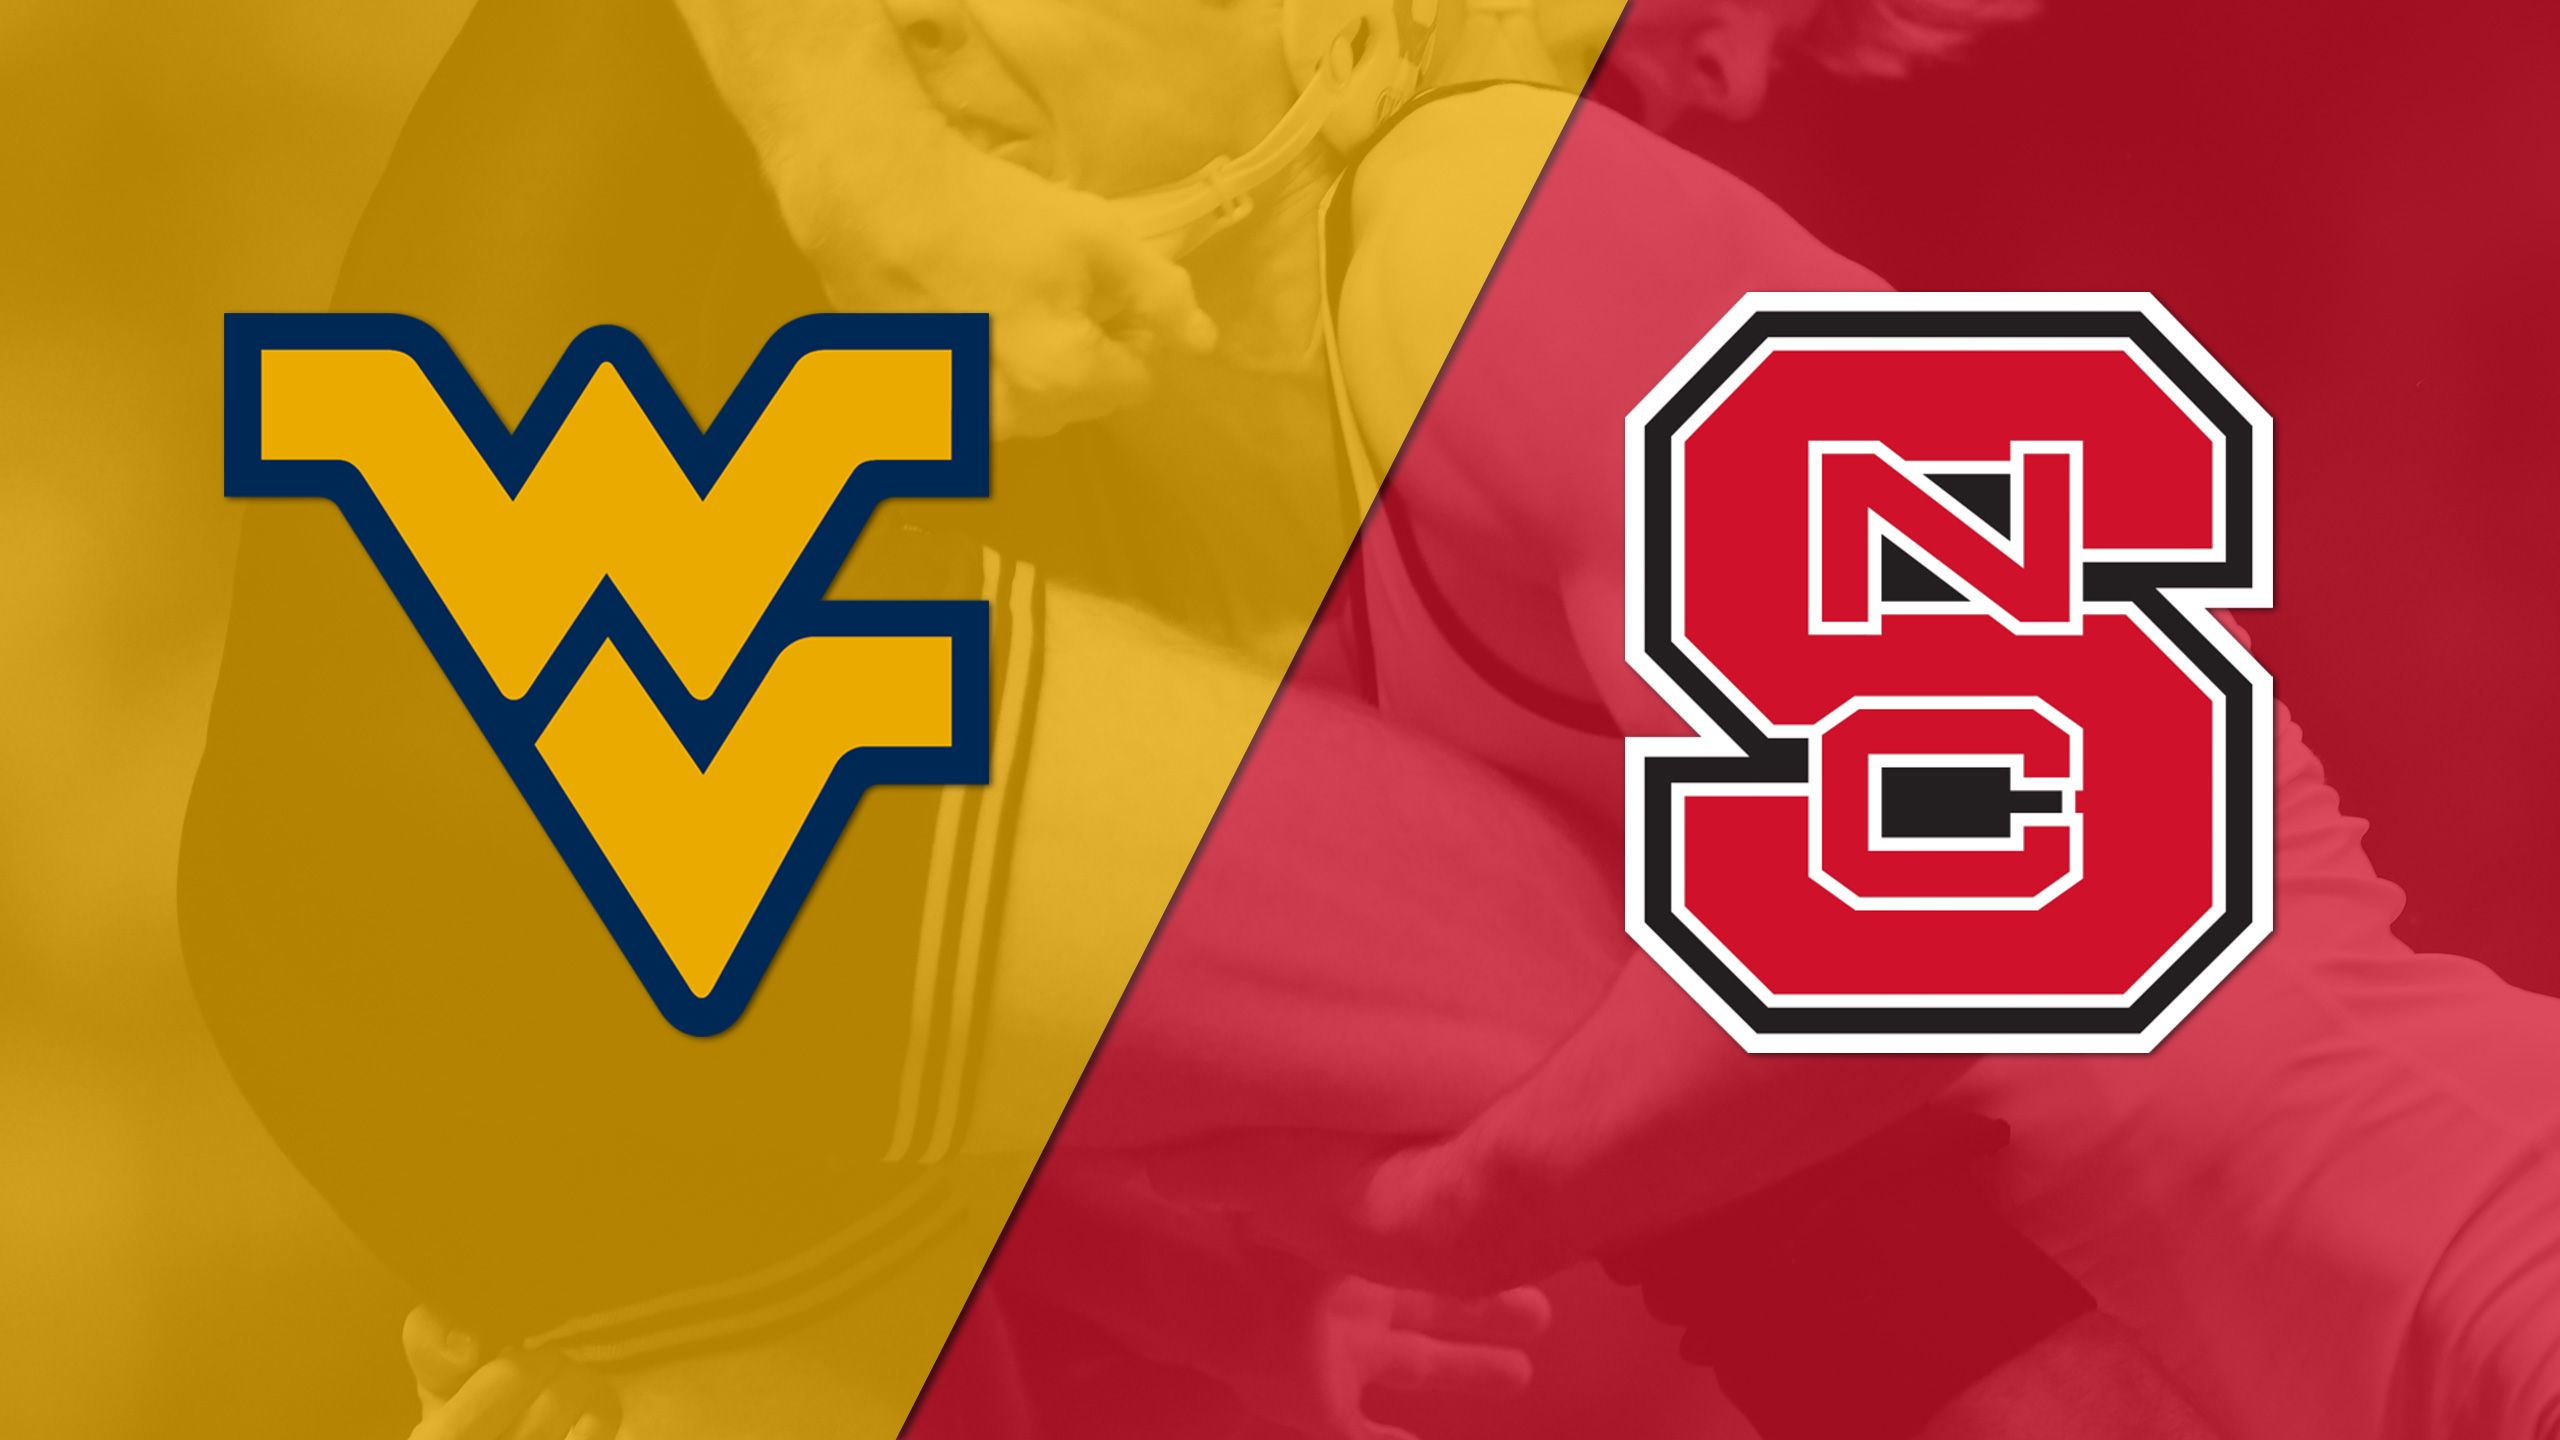 West Virginia vs. NC State (Wrestling)